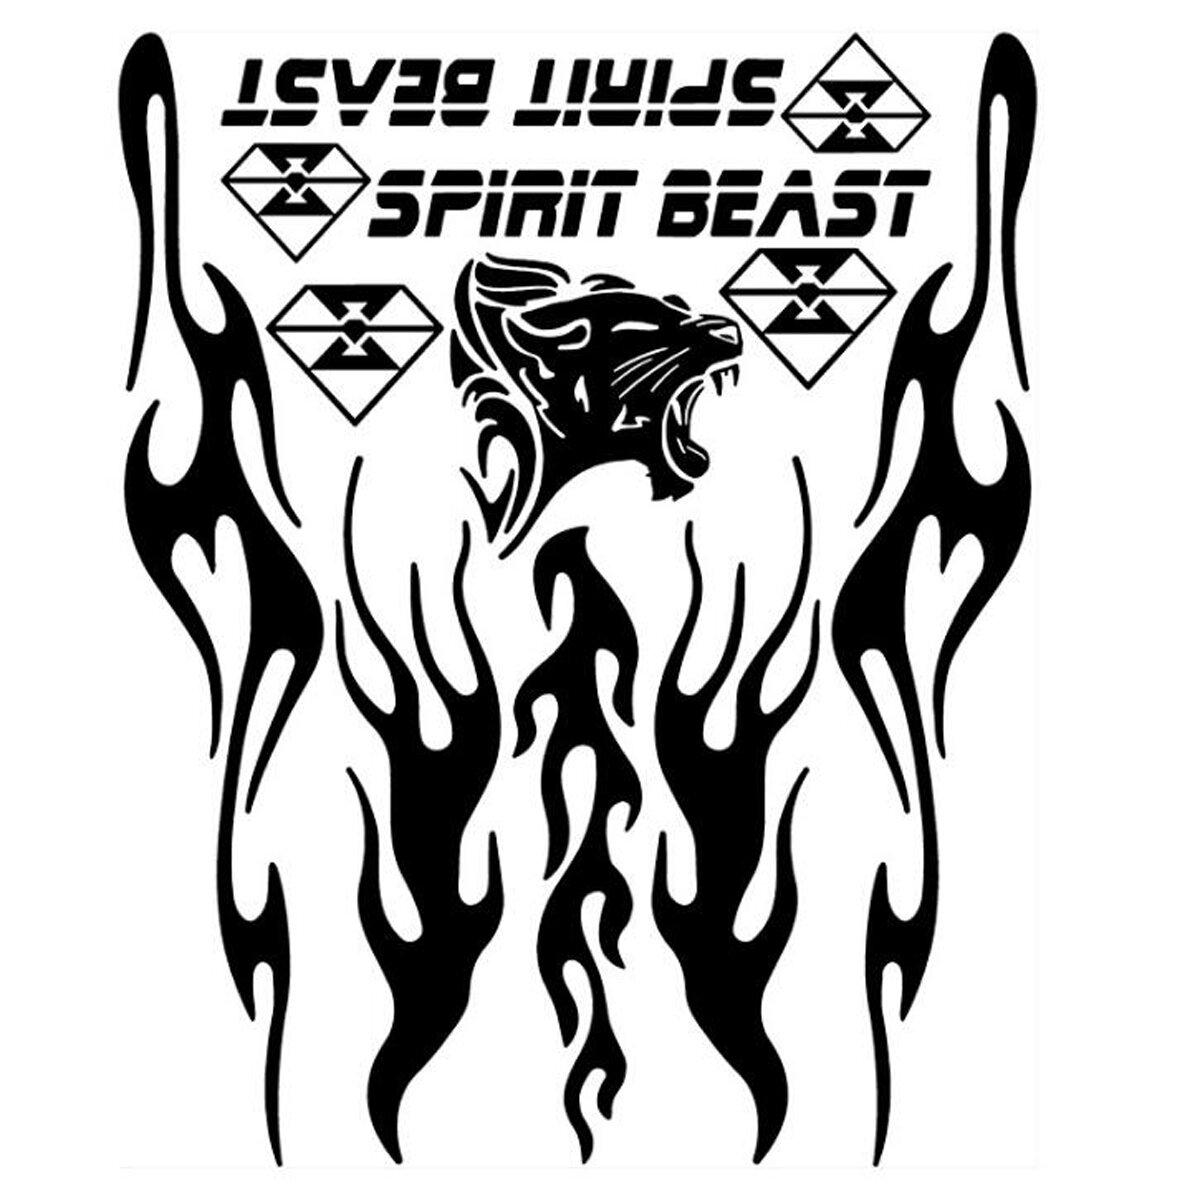 Benryhome Spirit Beast Reflective Motorcycle